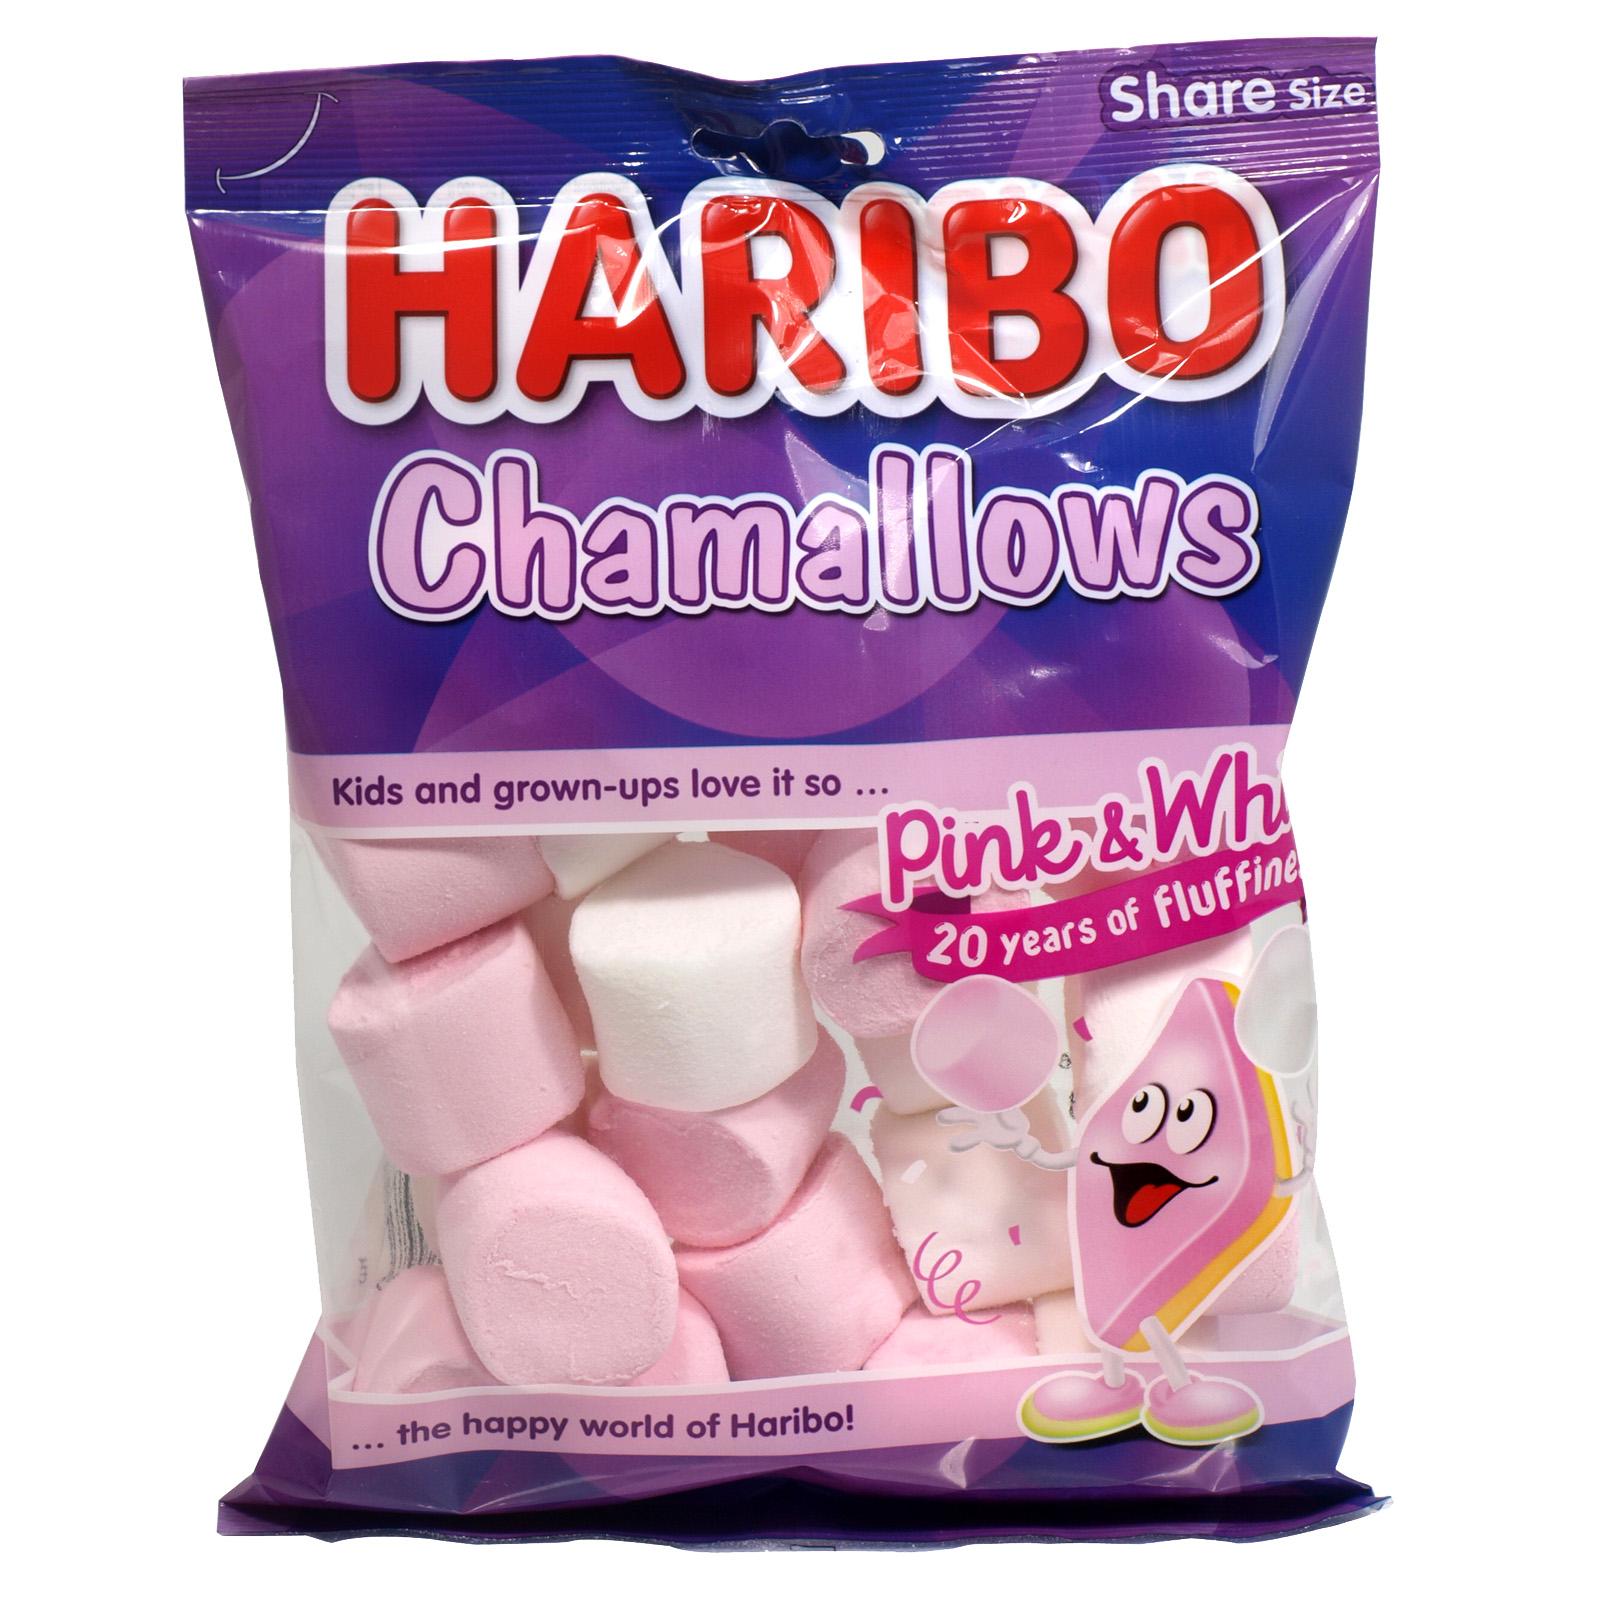 HARIBO 160GM BAGS CHARMALLOWS X12